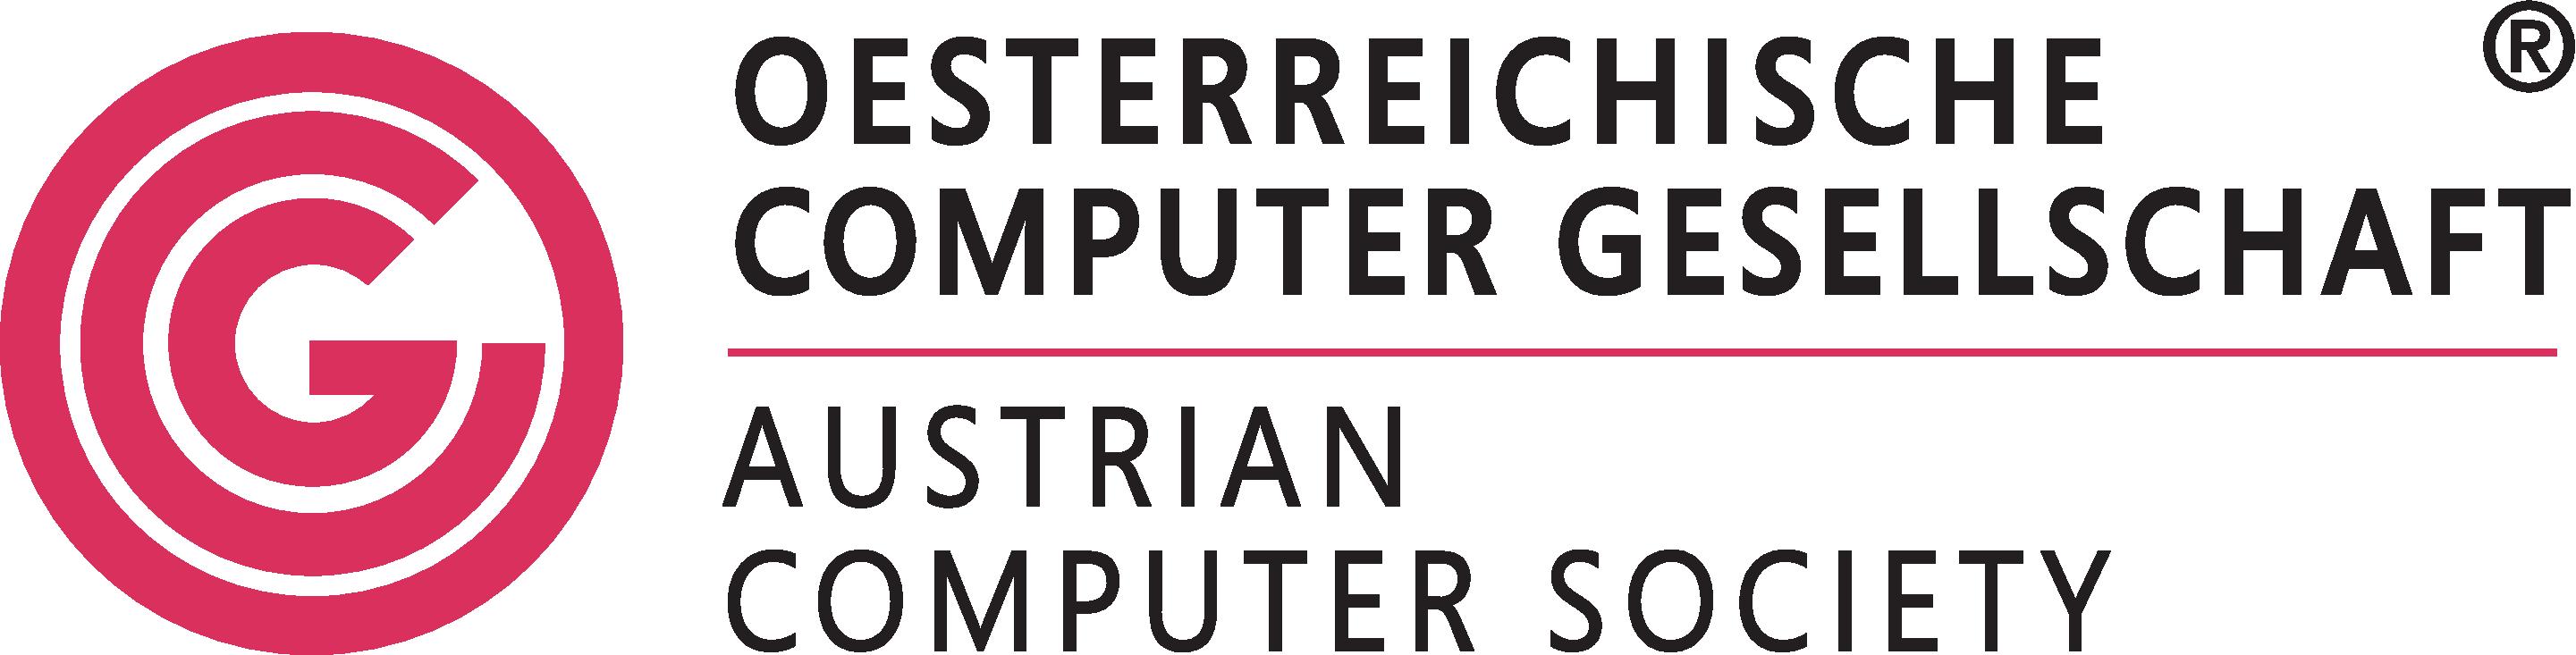 Austrian Computer Society